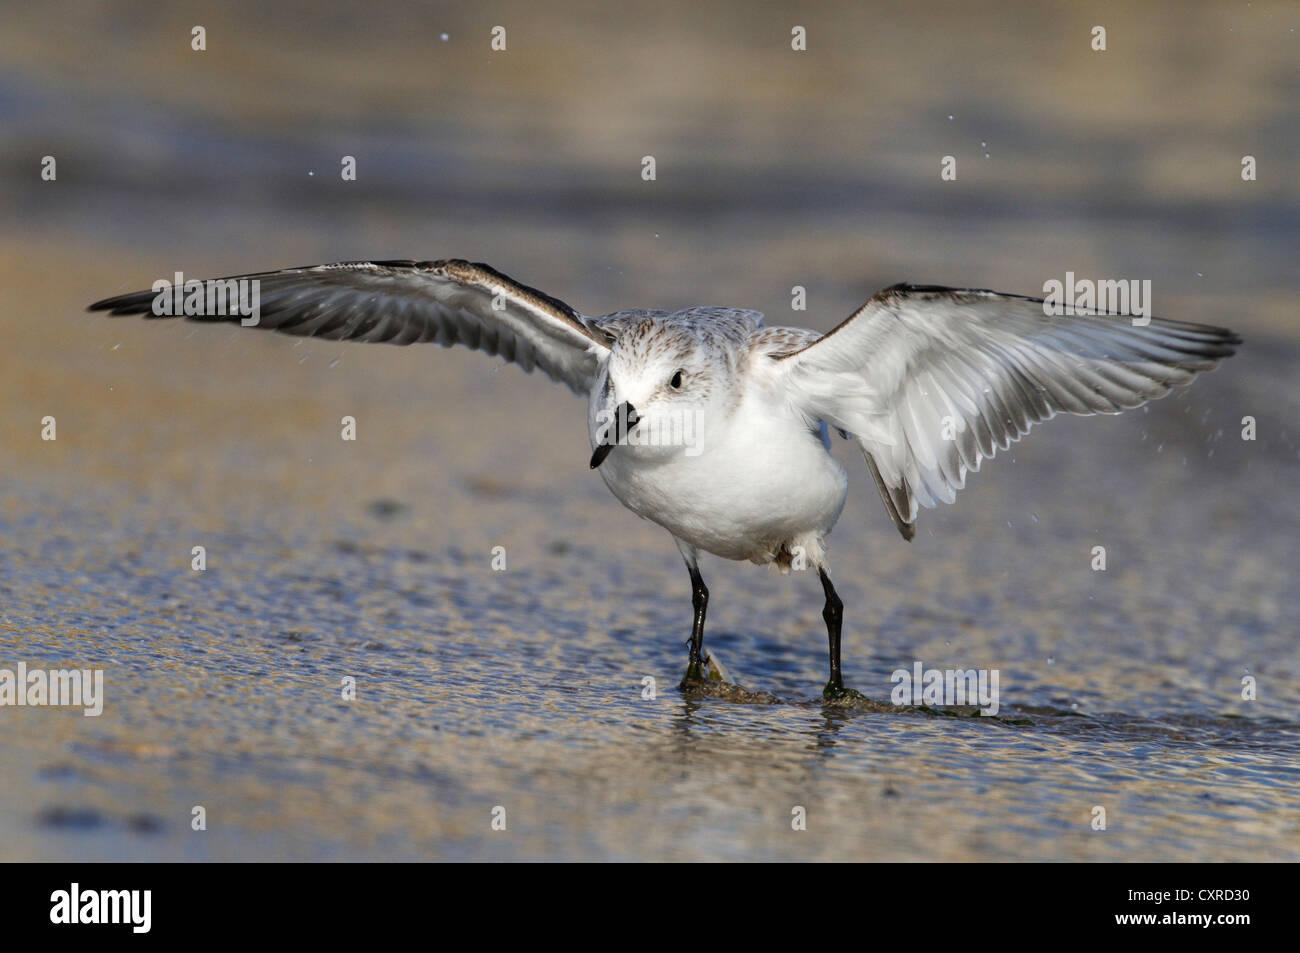 Sanderling (Calidris alba), with open wings, Black Sea coast, Bulgaria, Europe - Stock Image